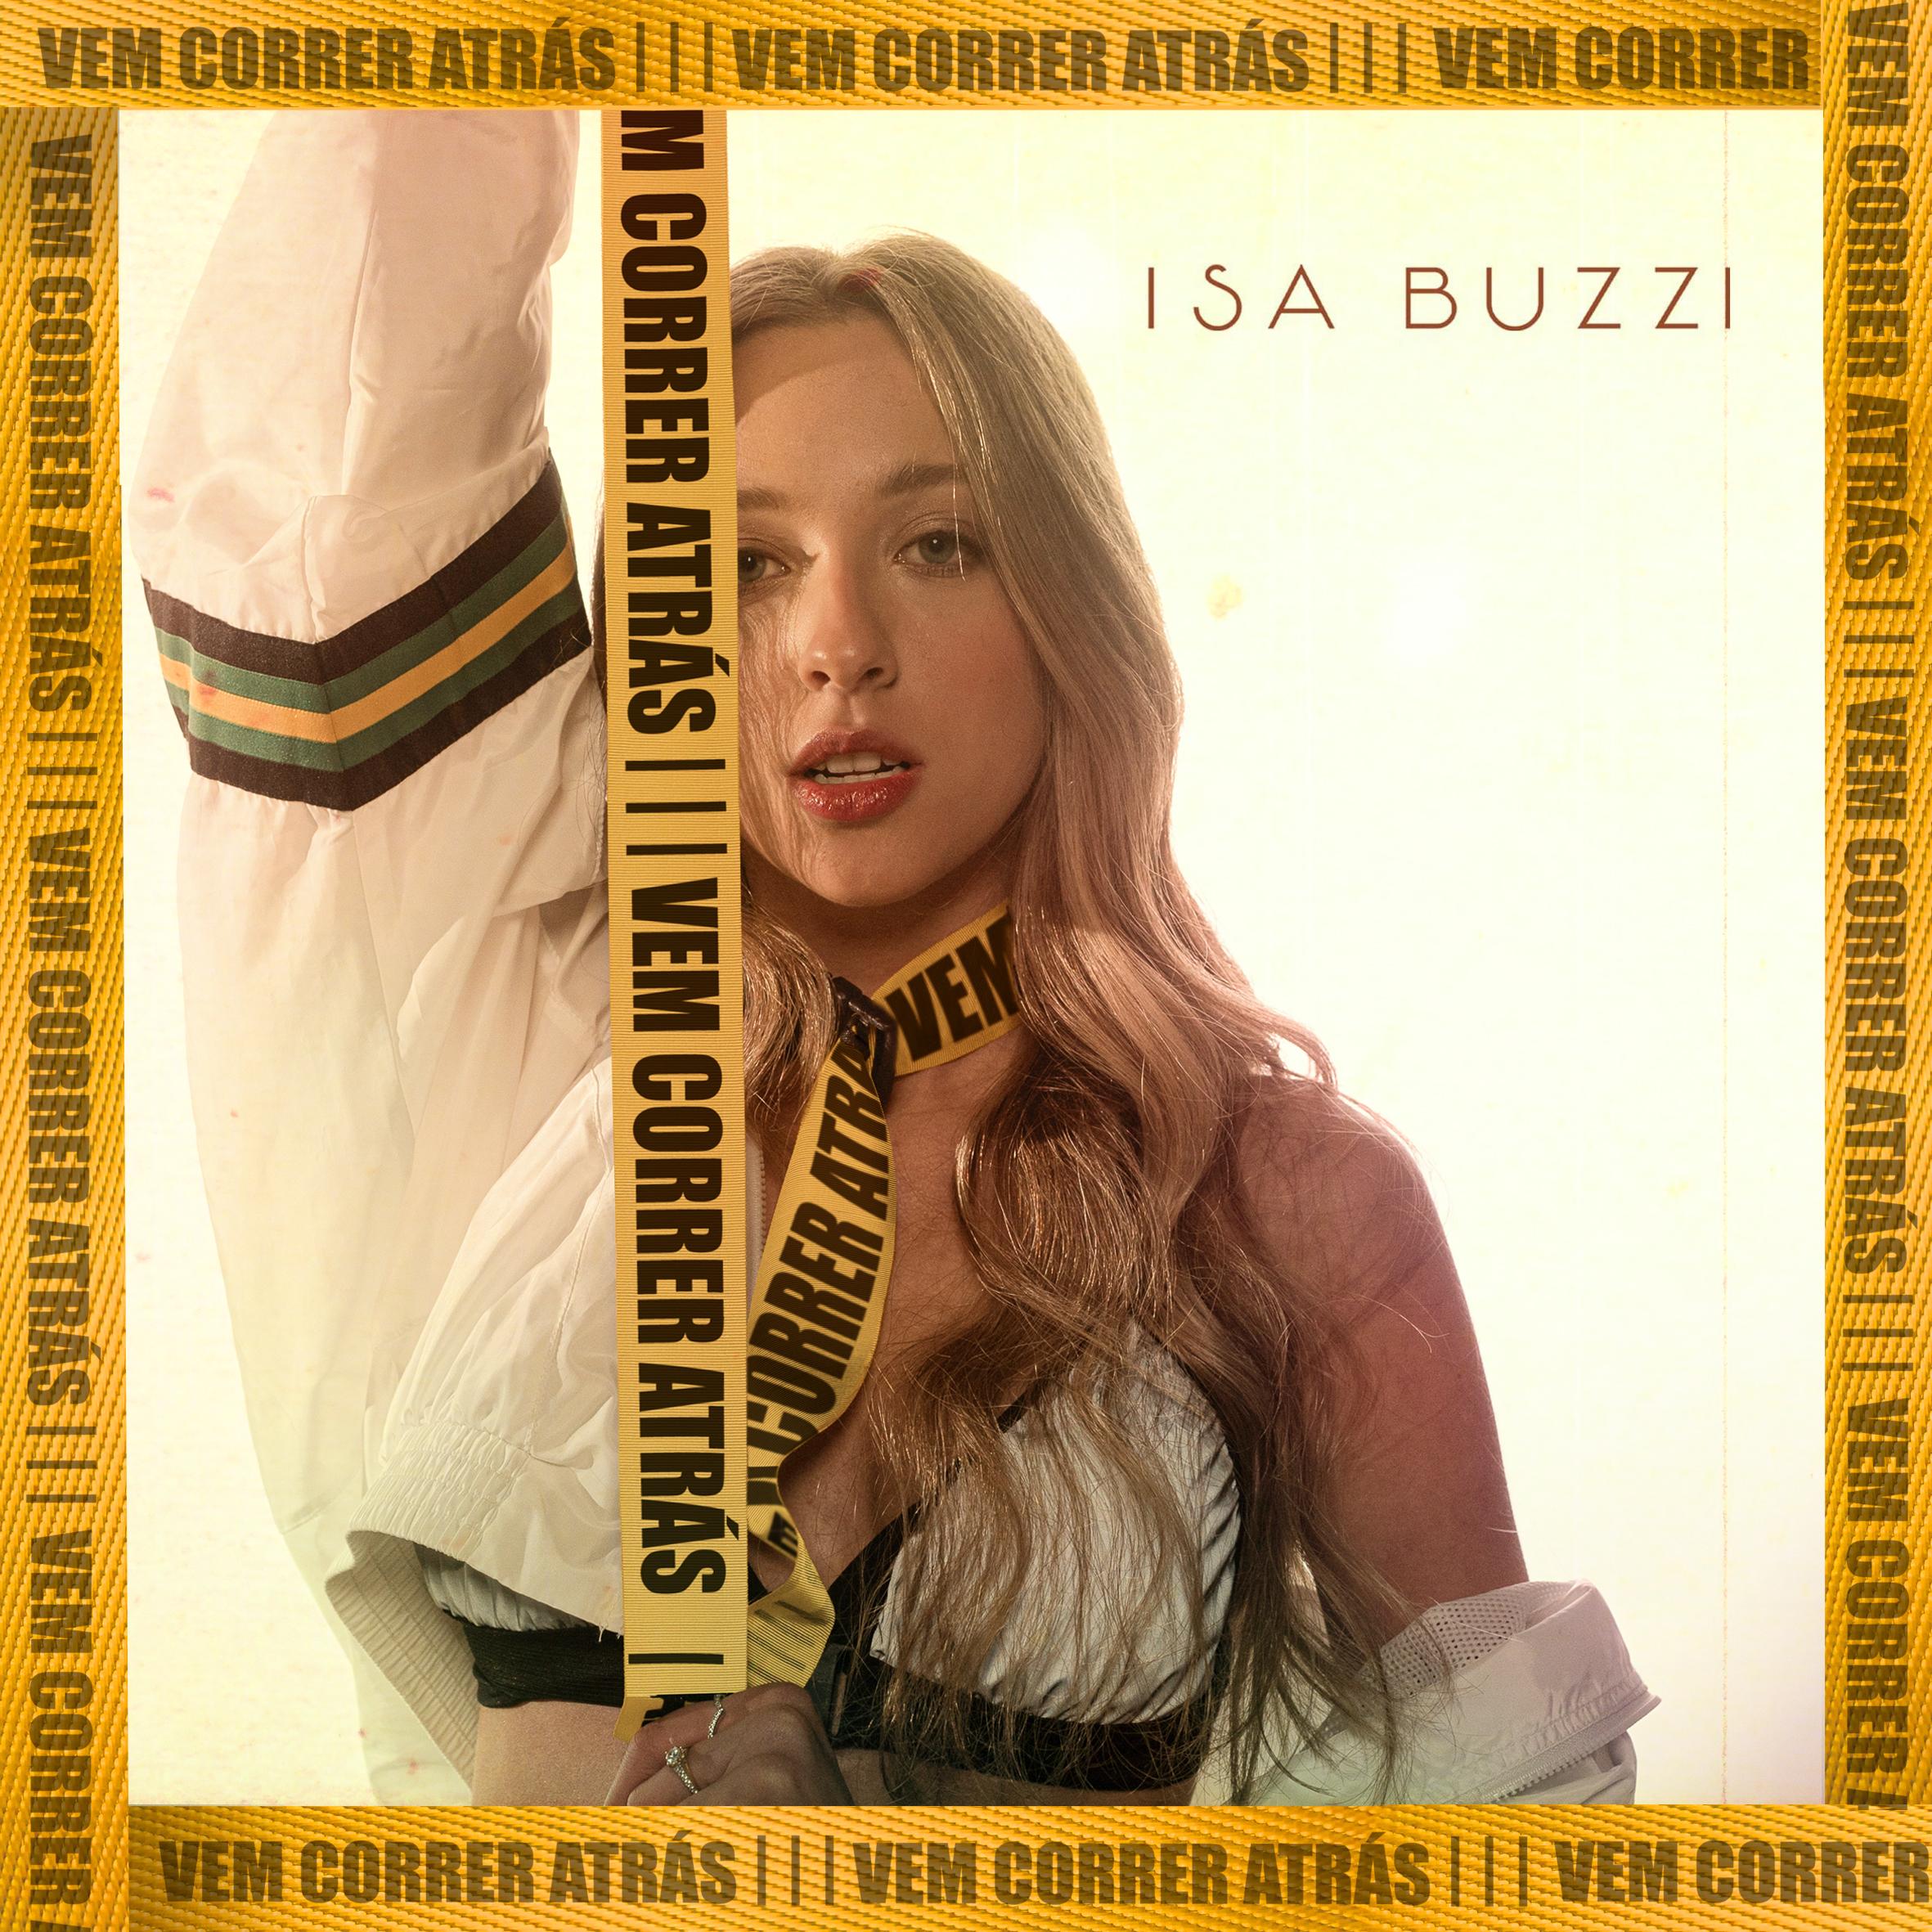 Isa Buzzi – Vem correr atrás